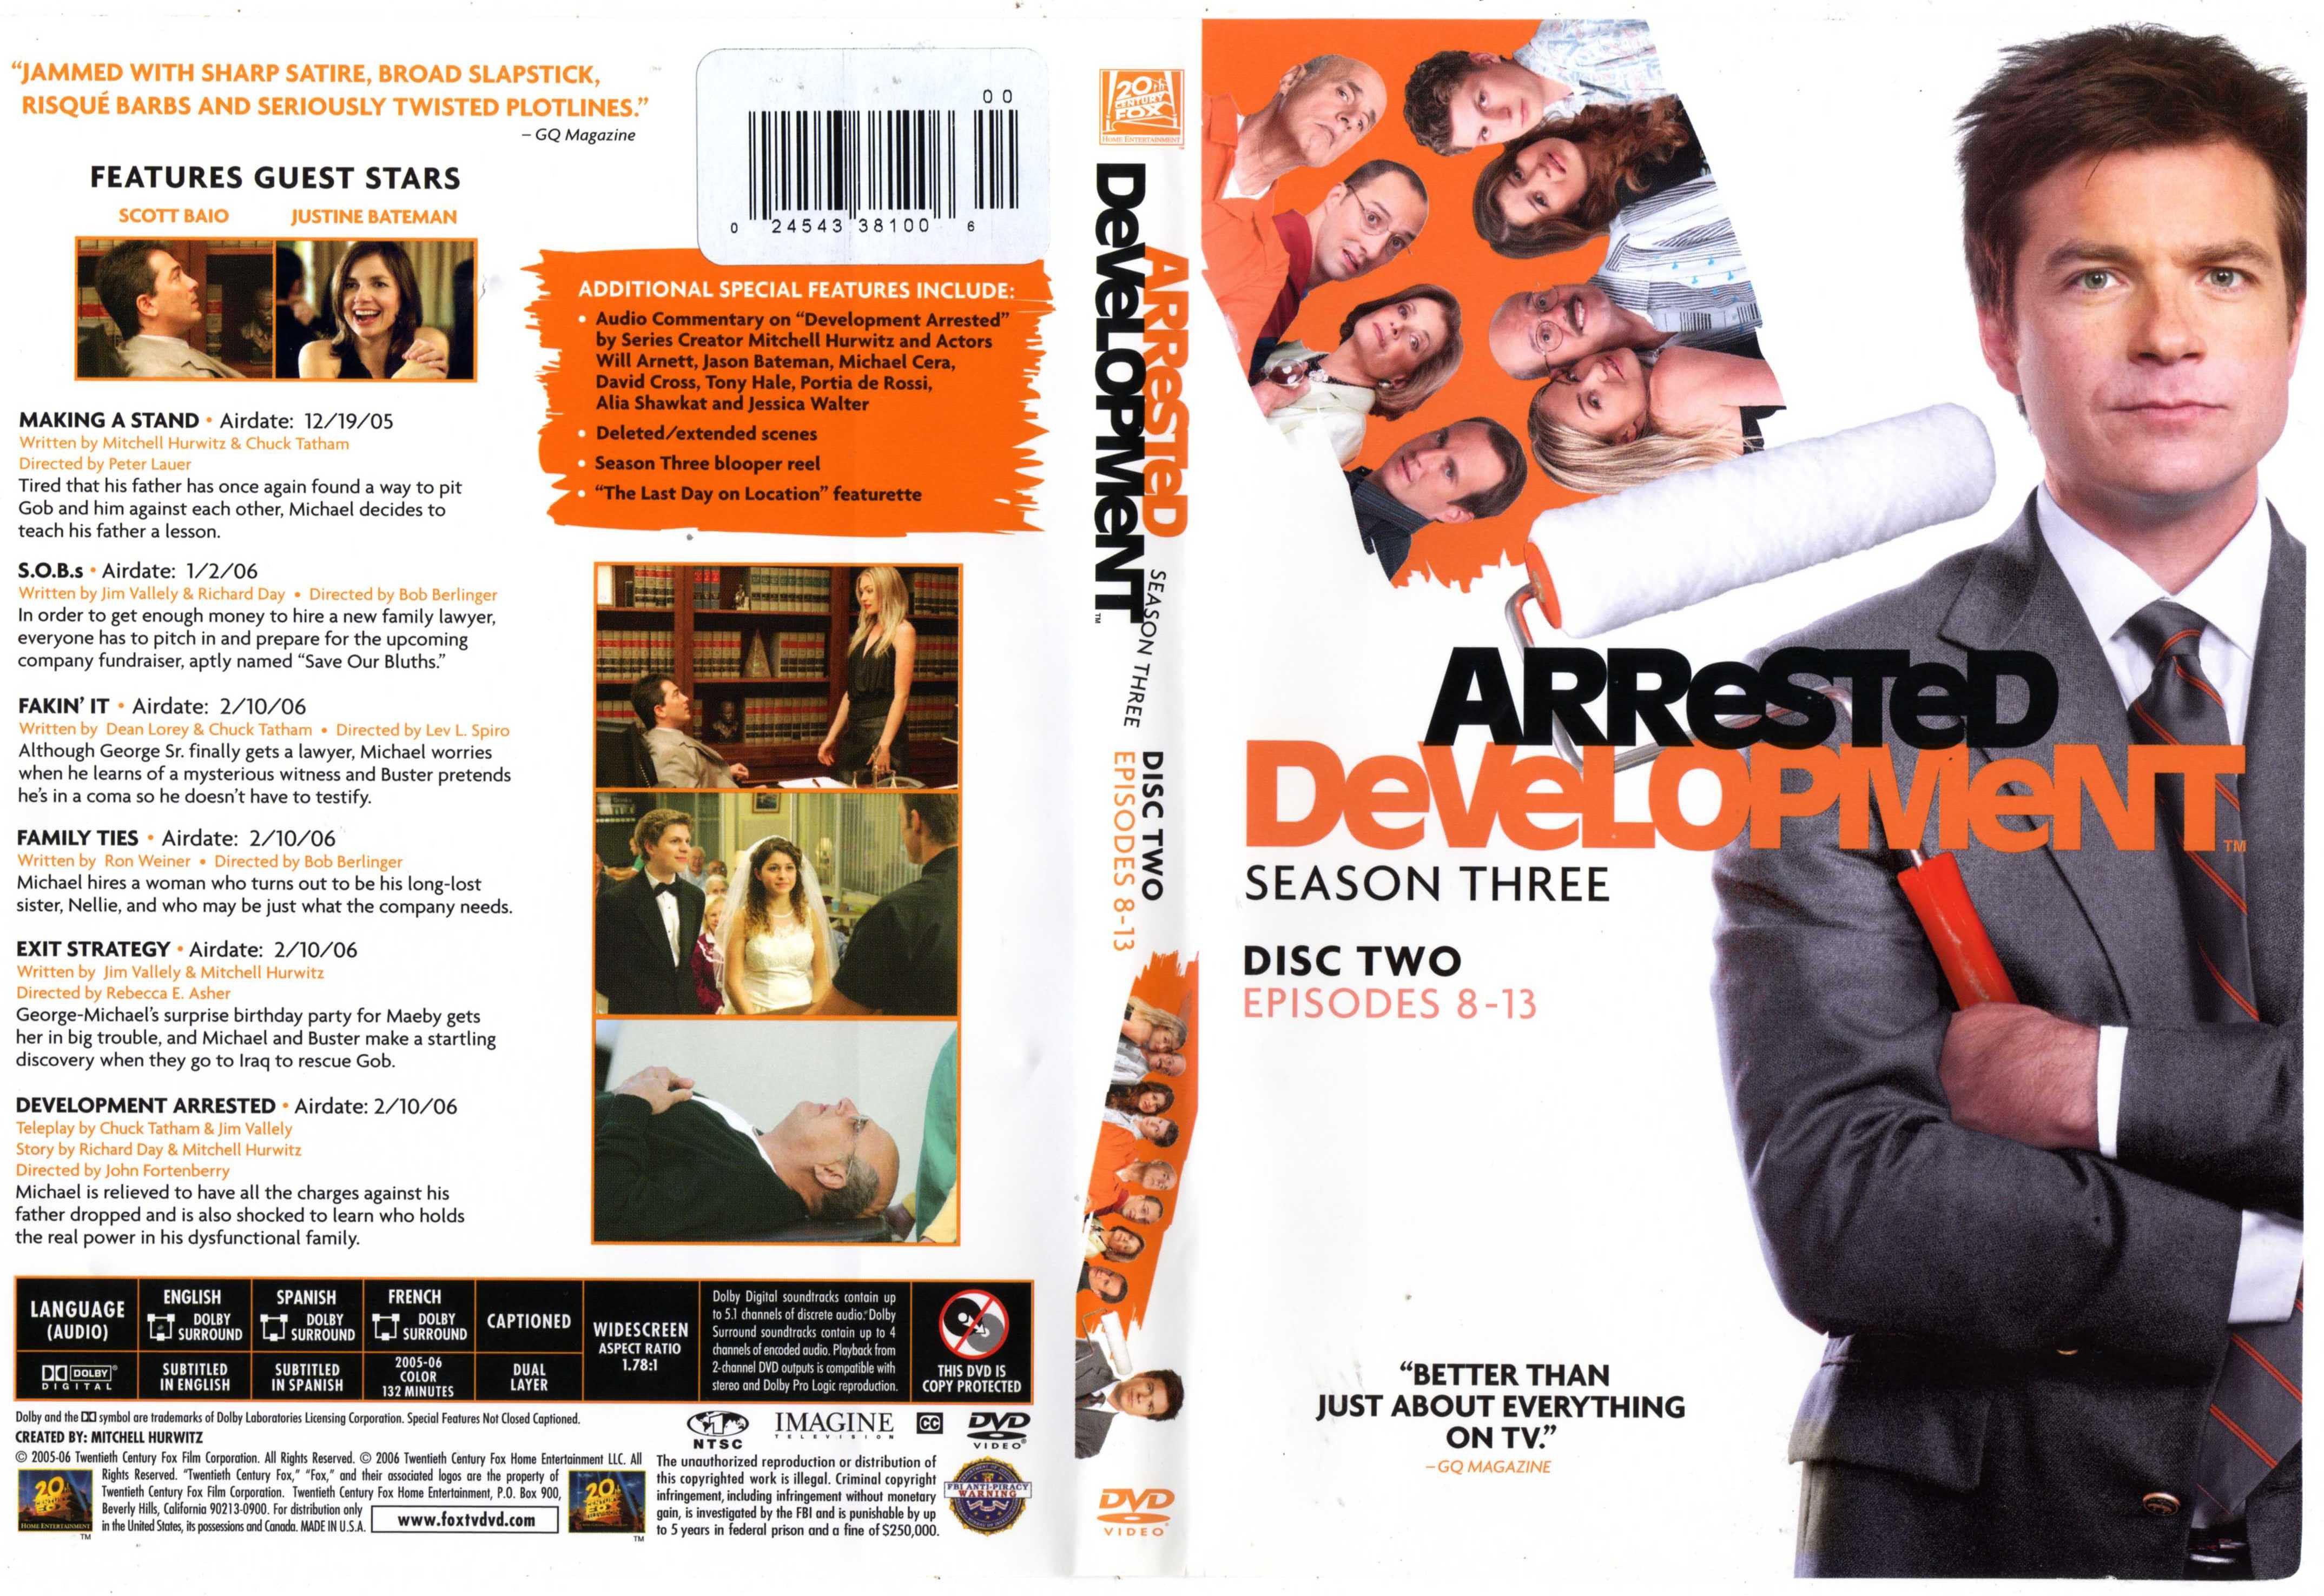 Aressted development movie